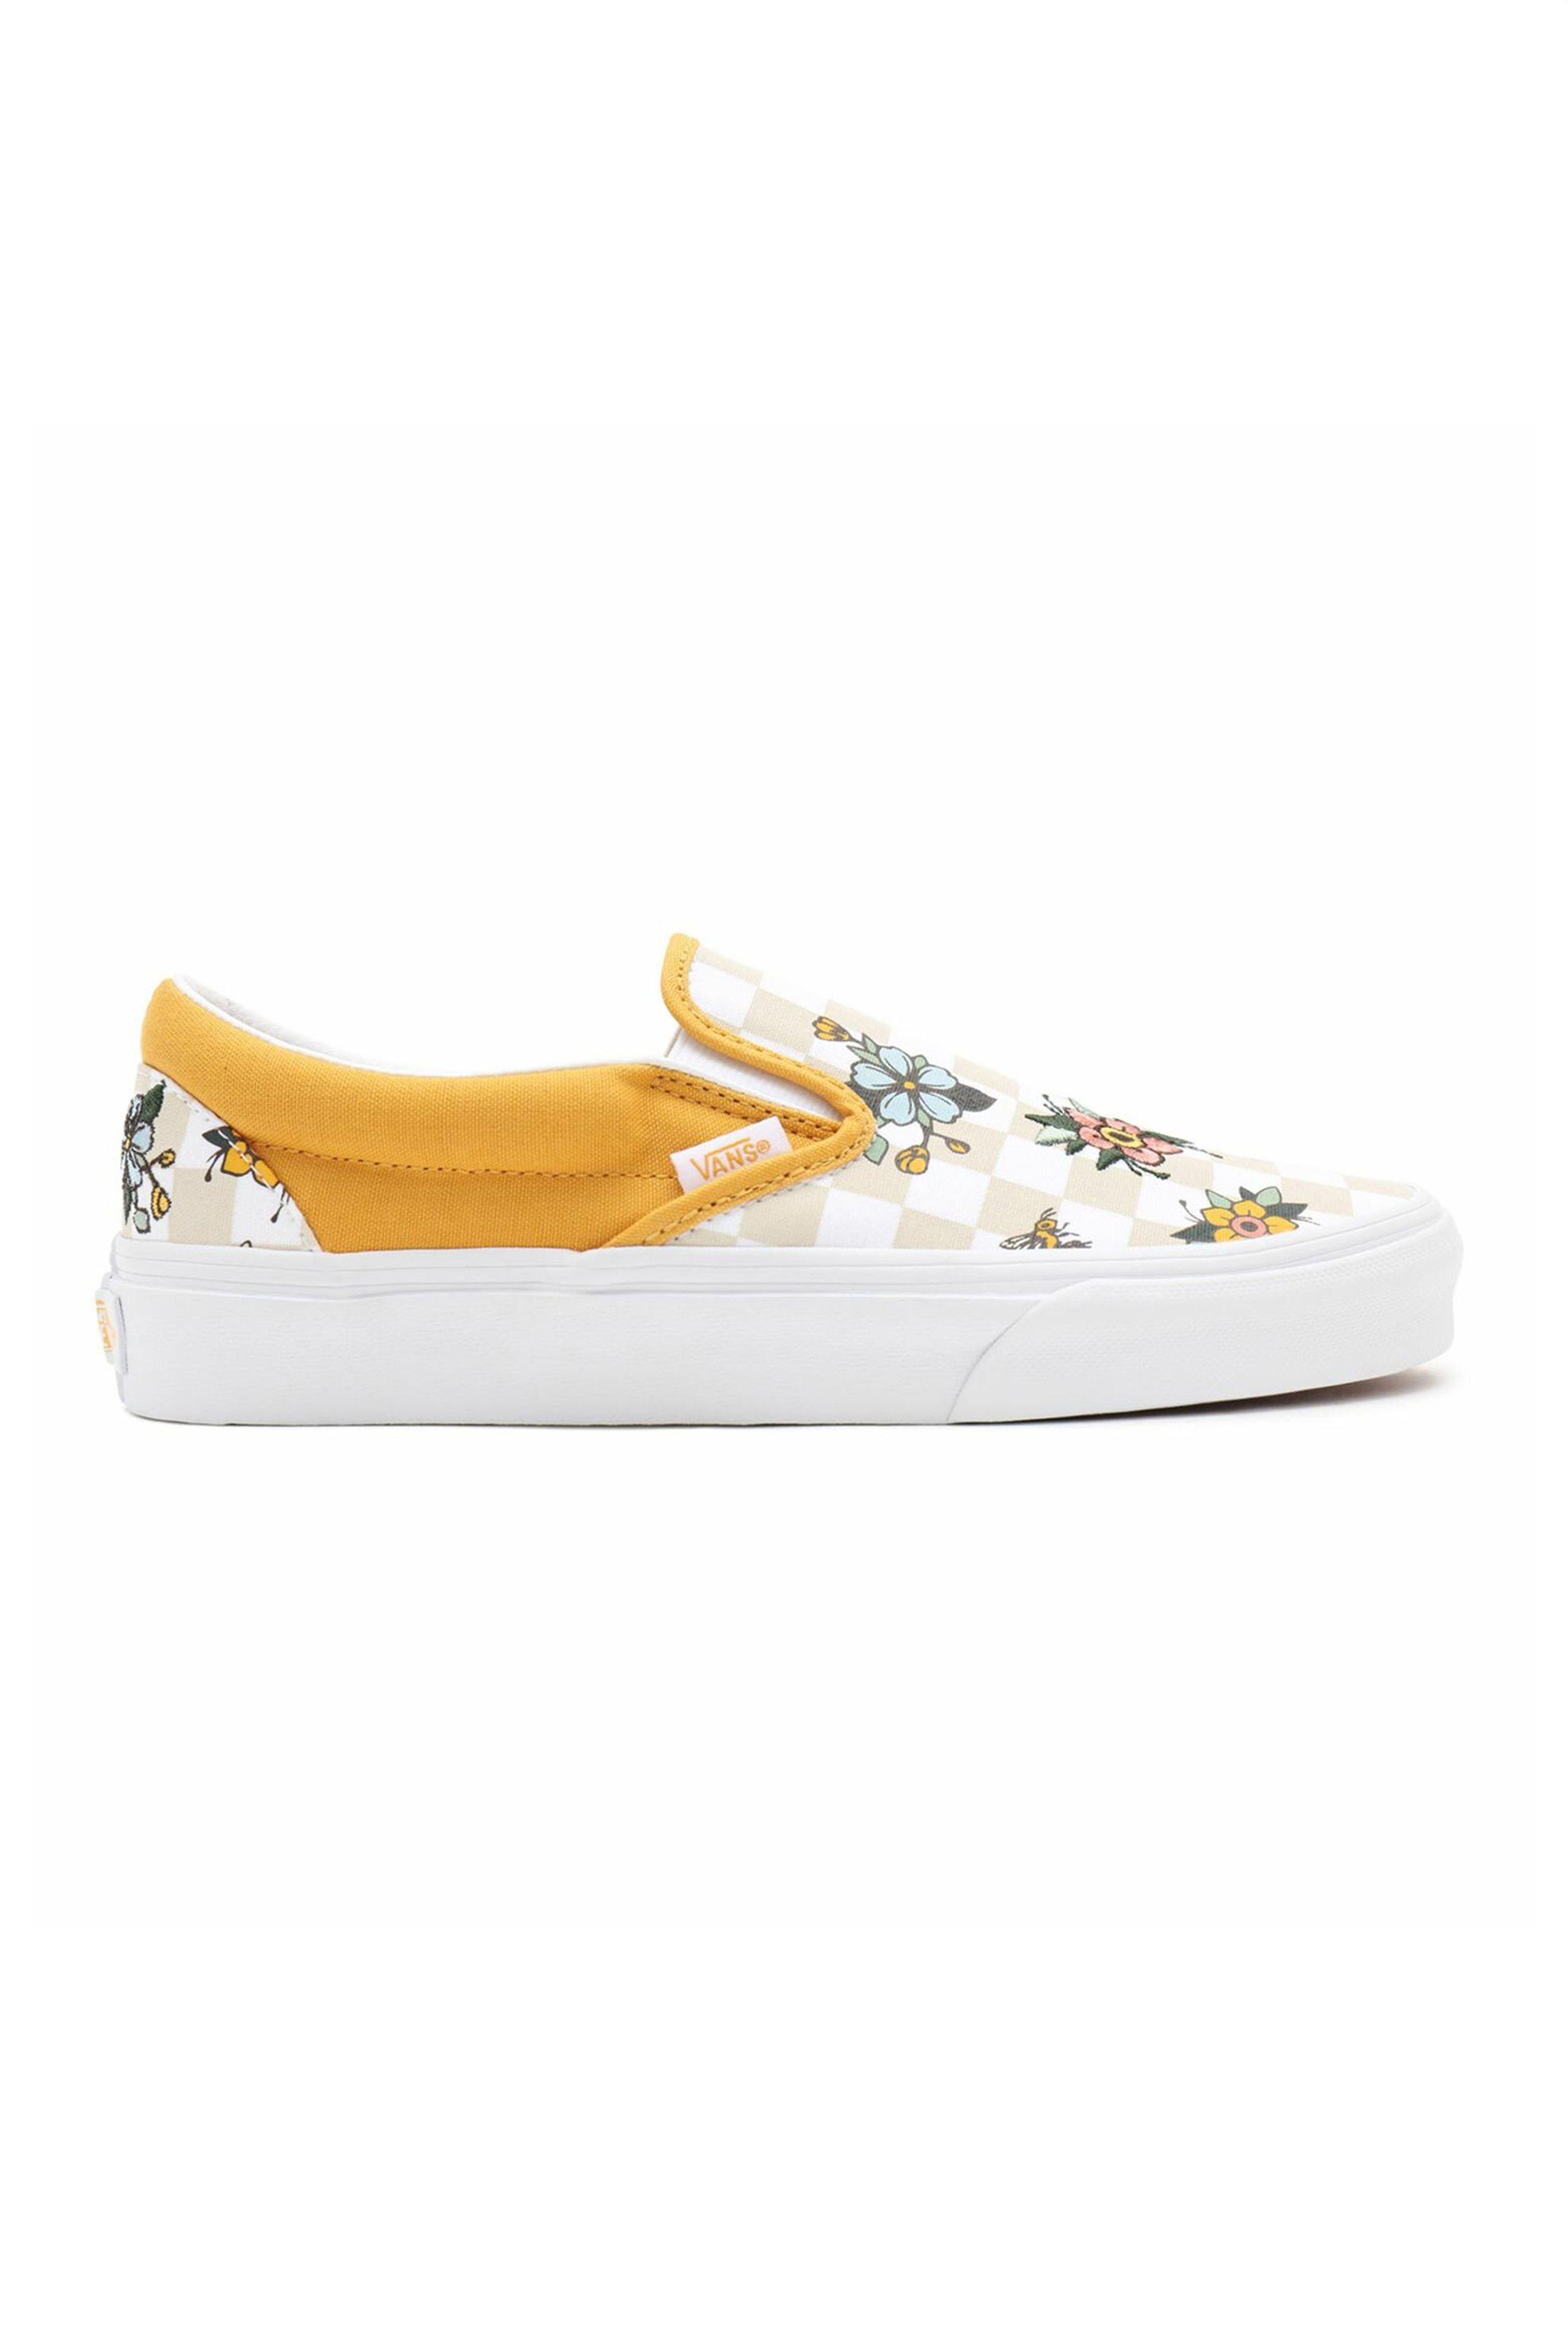 "Vans unisex υφασμάτινα παπούτσια με checkerboard print ""Garden Check Classic Slip-On"" – VN0A33TB9HP1 – Κίτρινο"